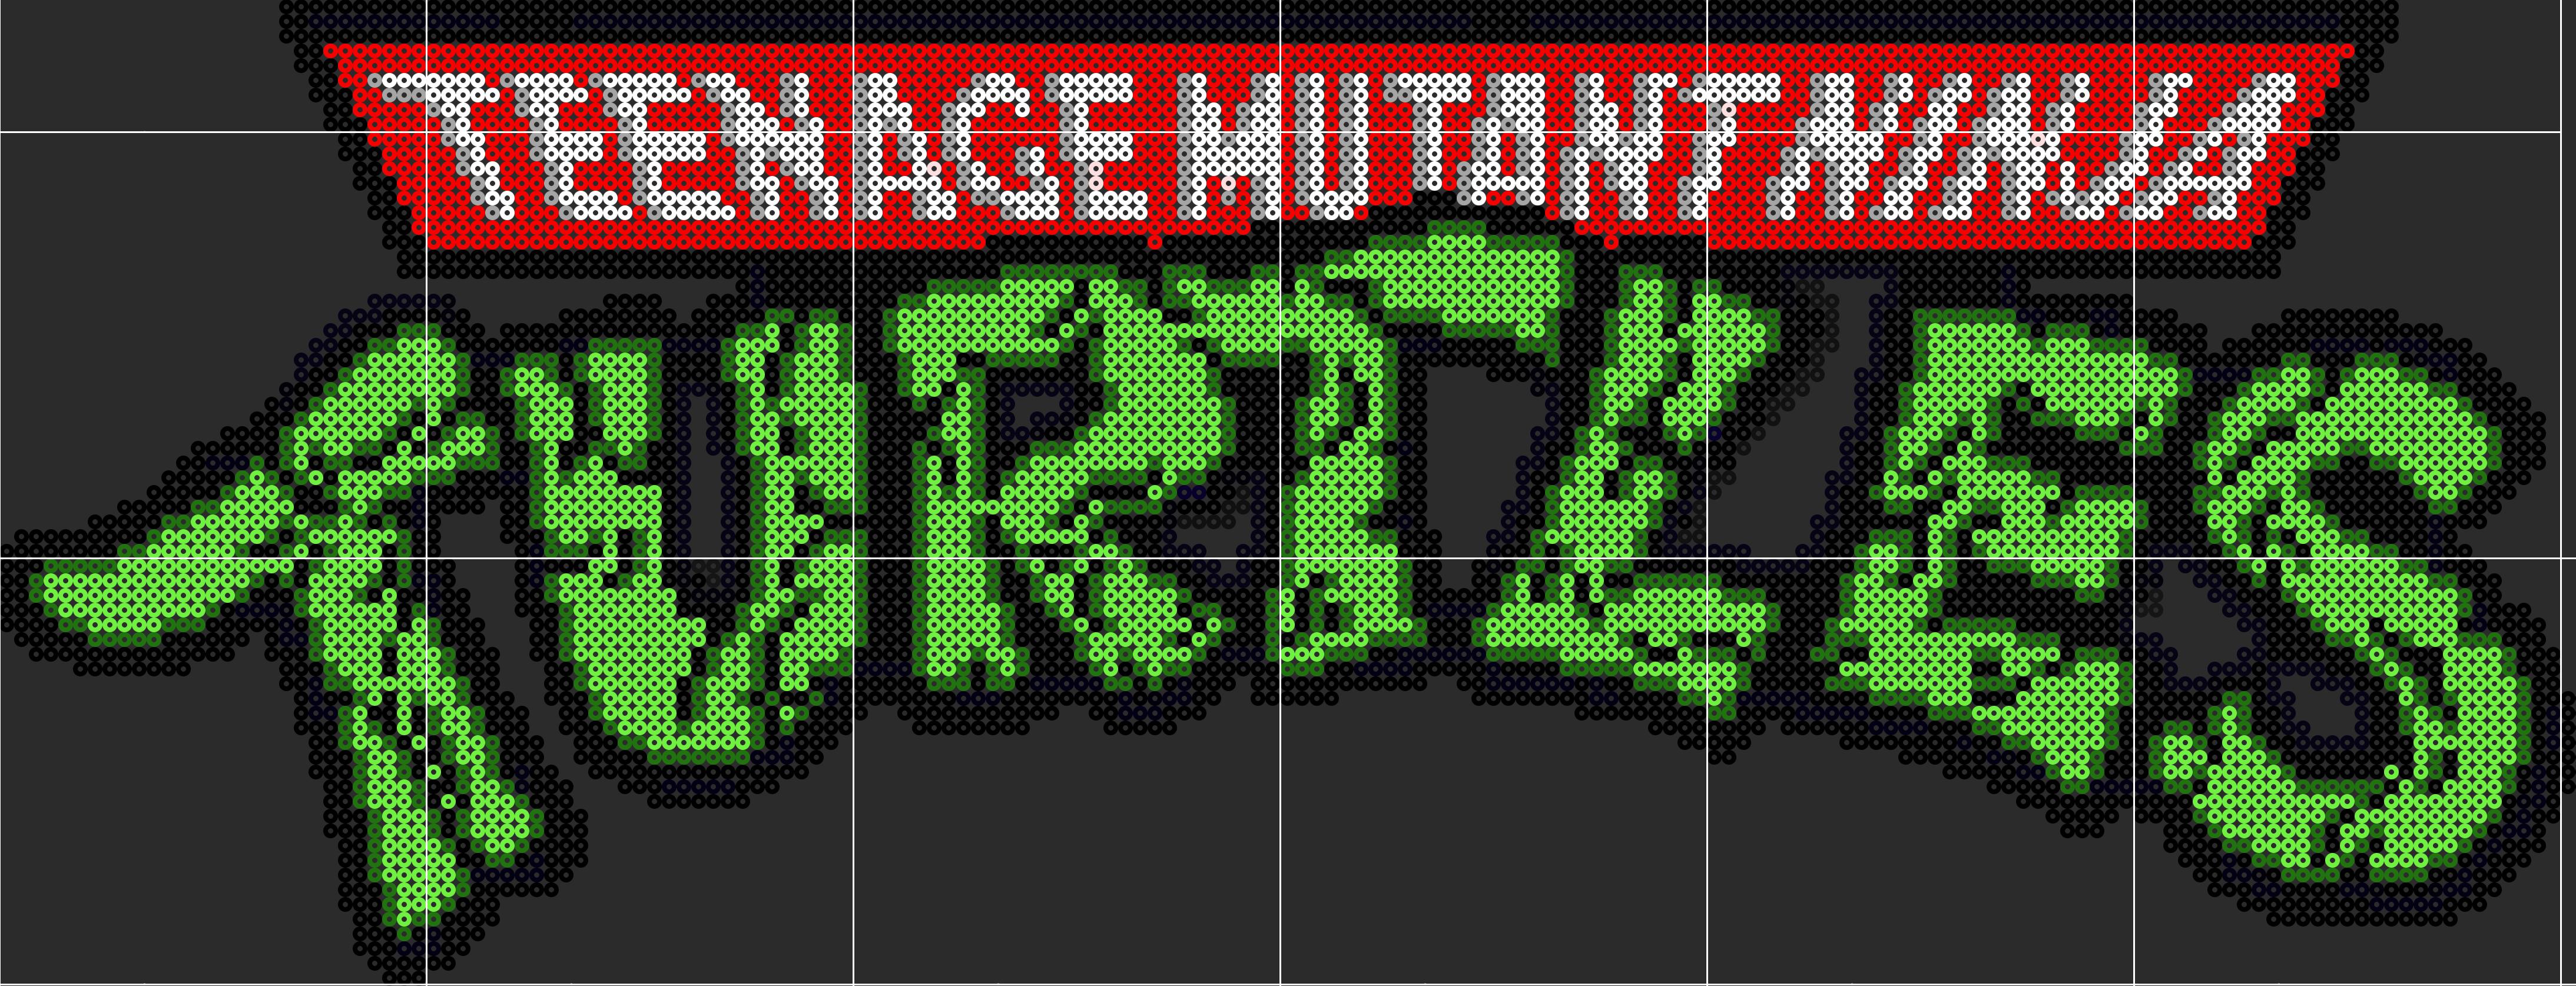 Tmnt Logo Sprite Template By D1a13lo D7wzmu4 Png 4375 1675 Tmnt Sprite Pixel Art Grid